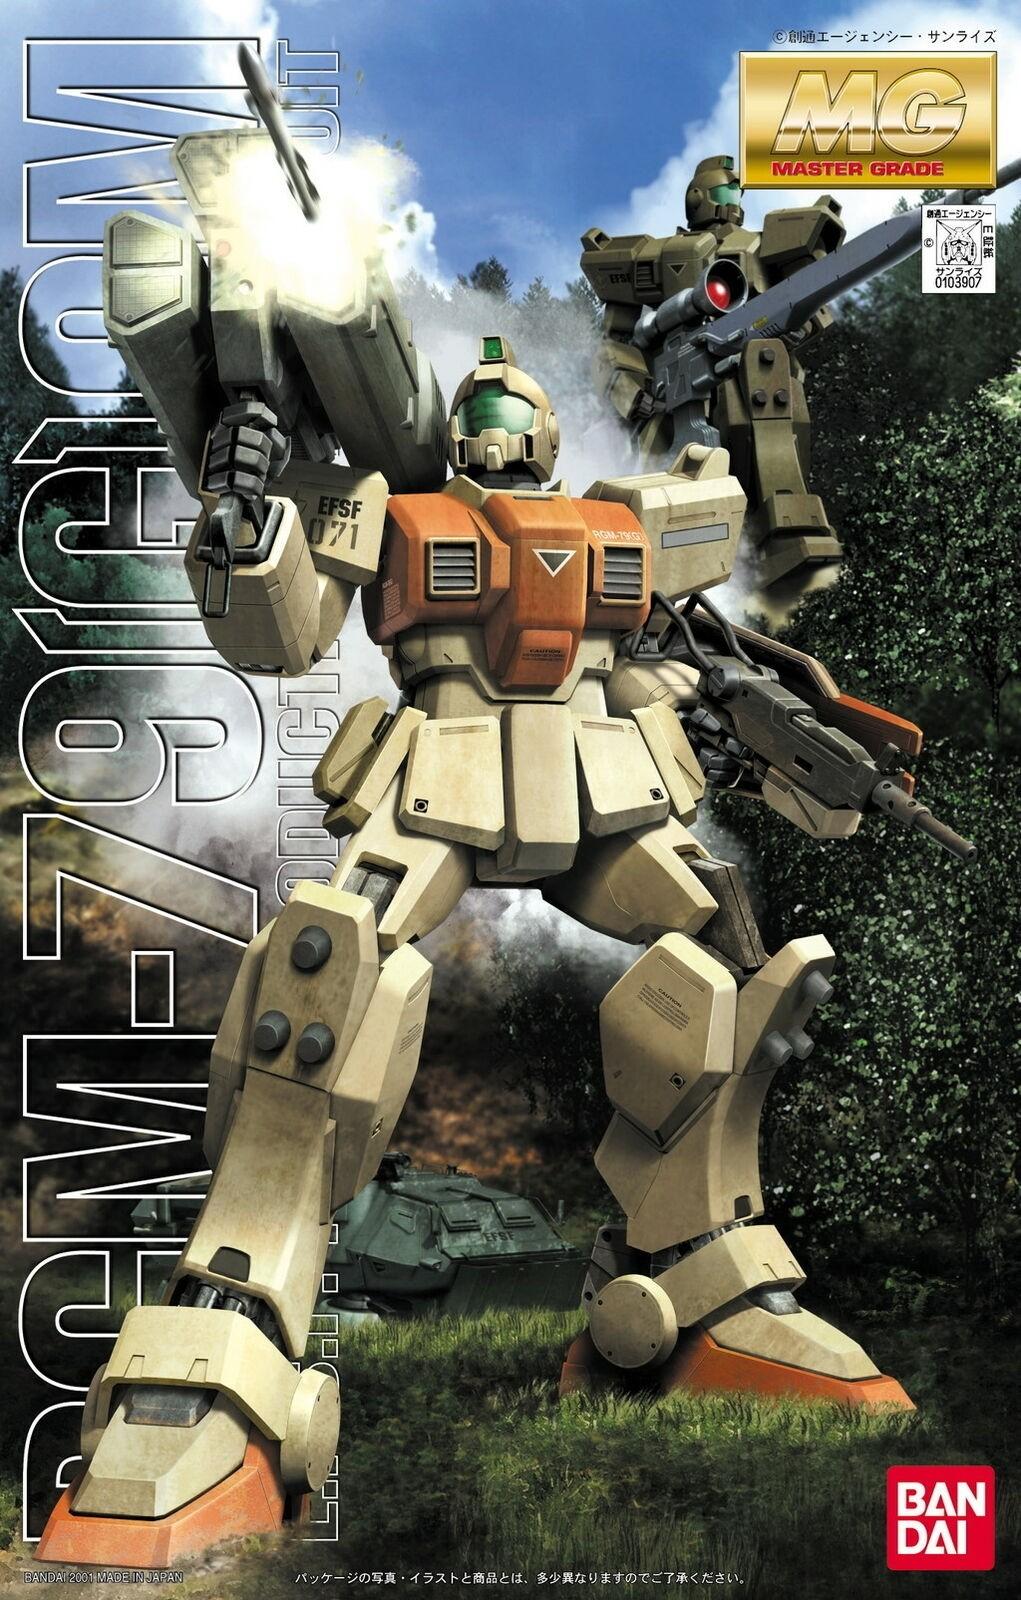 MG RMG-79 [G] GM 1/100 - GUNPLA